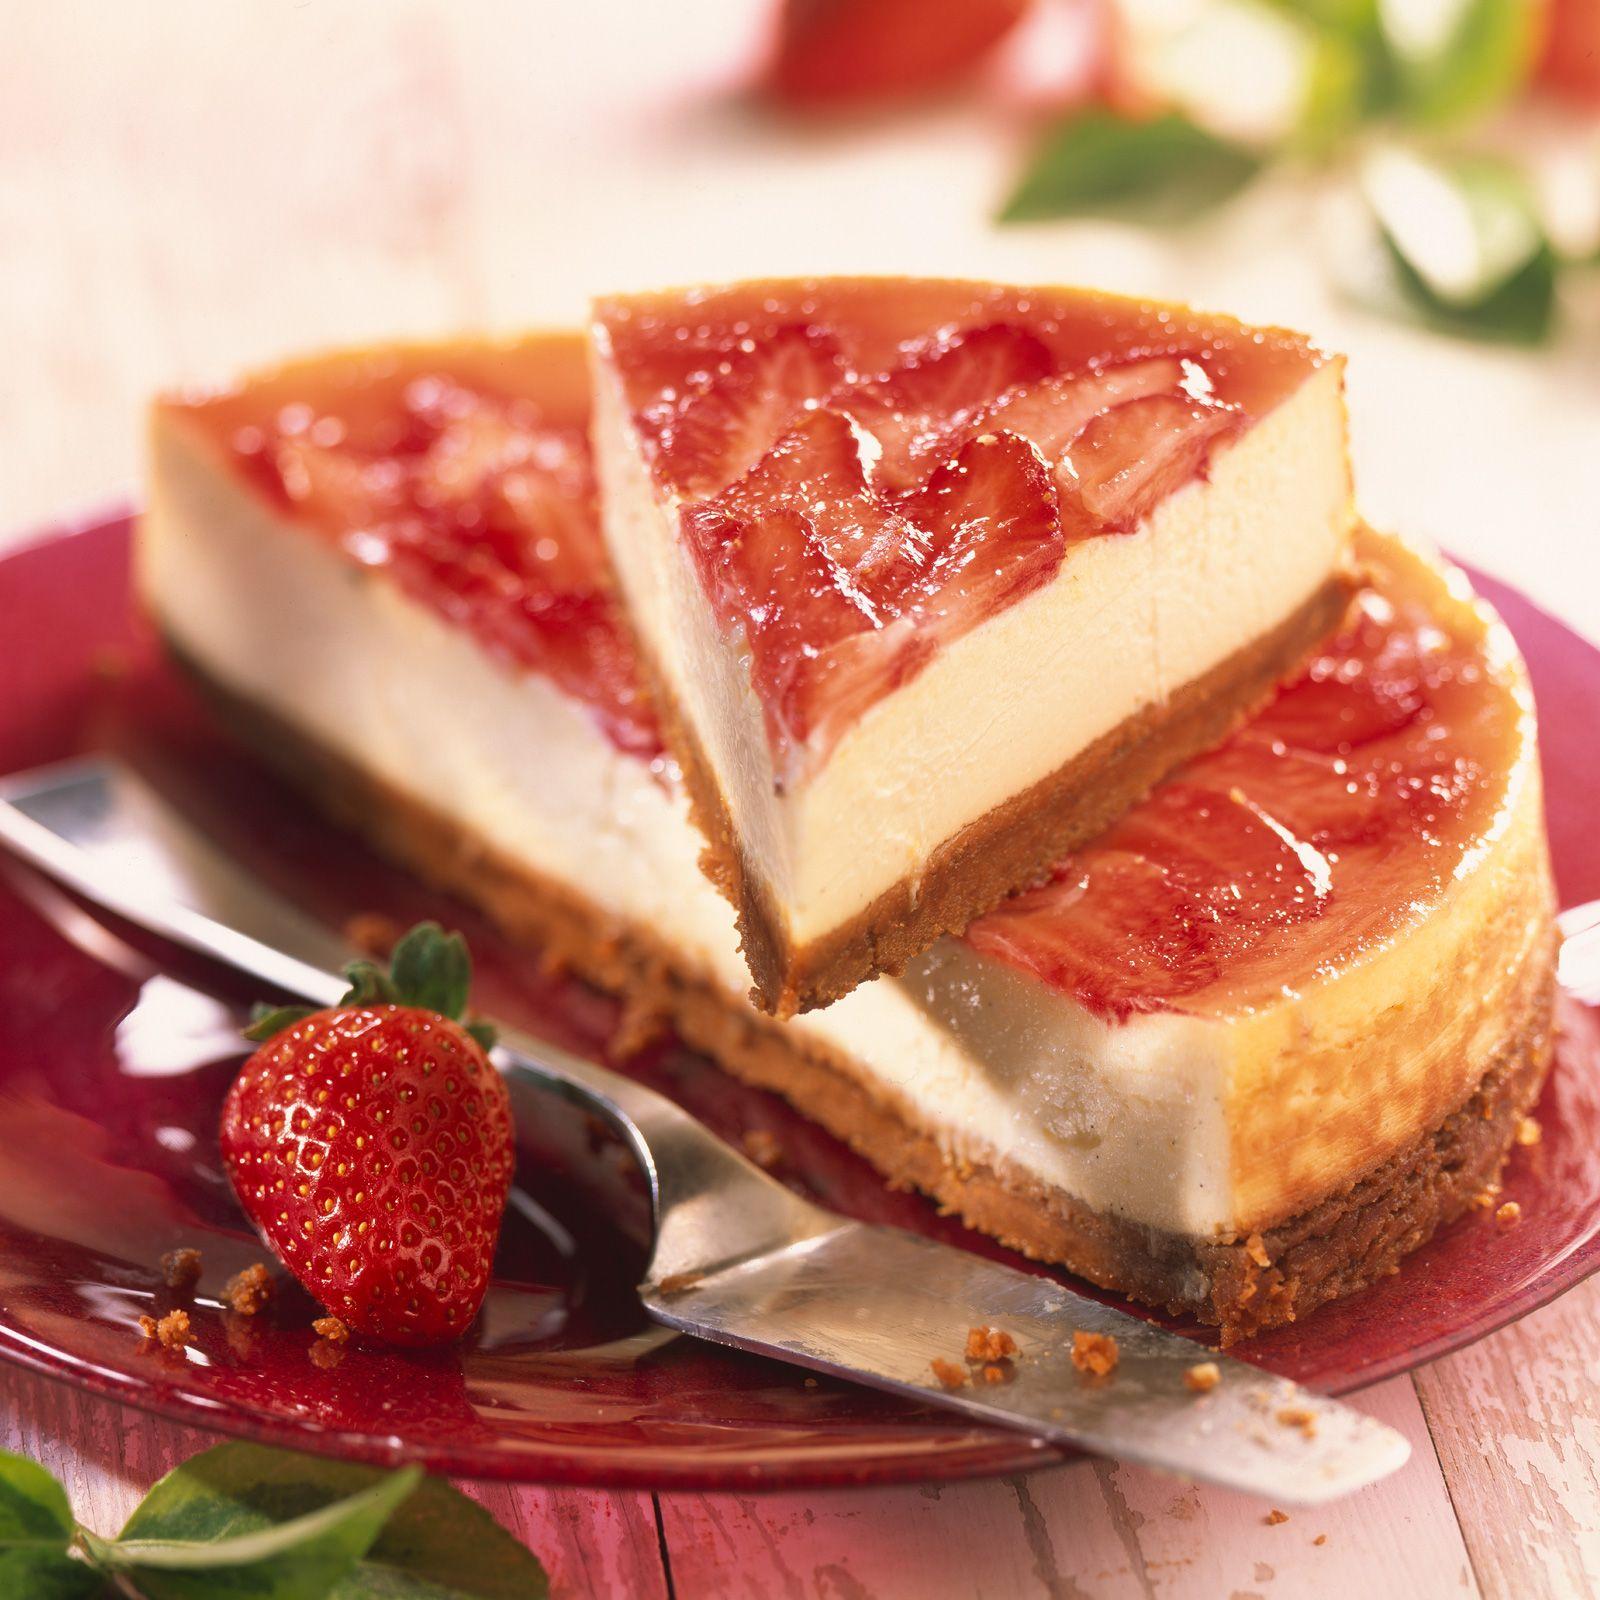 Gateau avec fraise et framboise